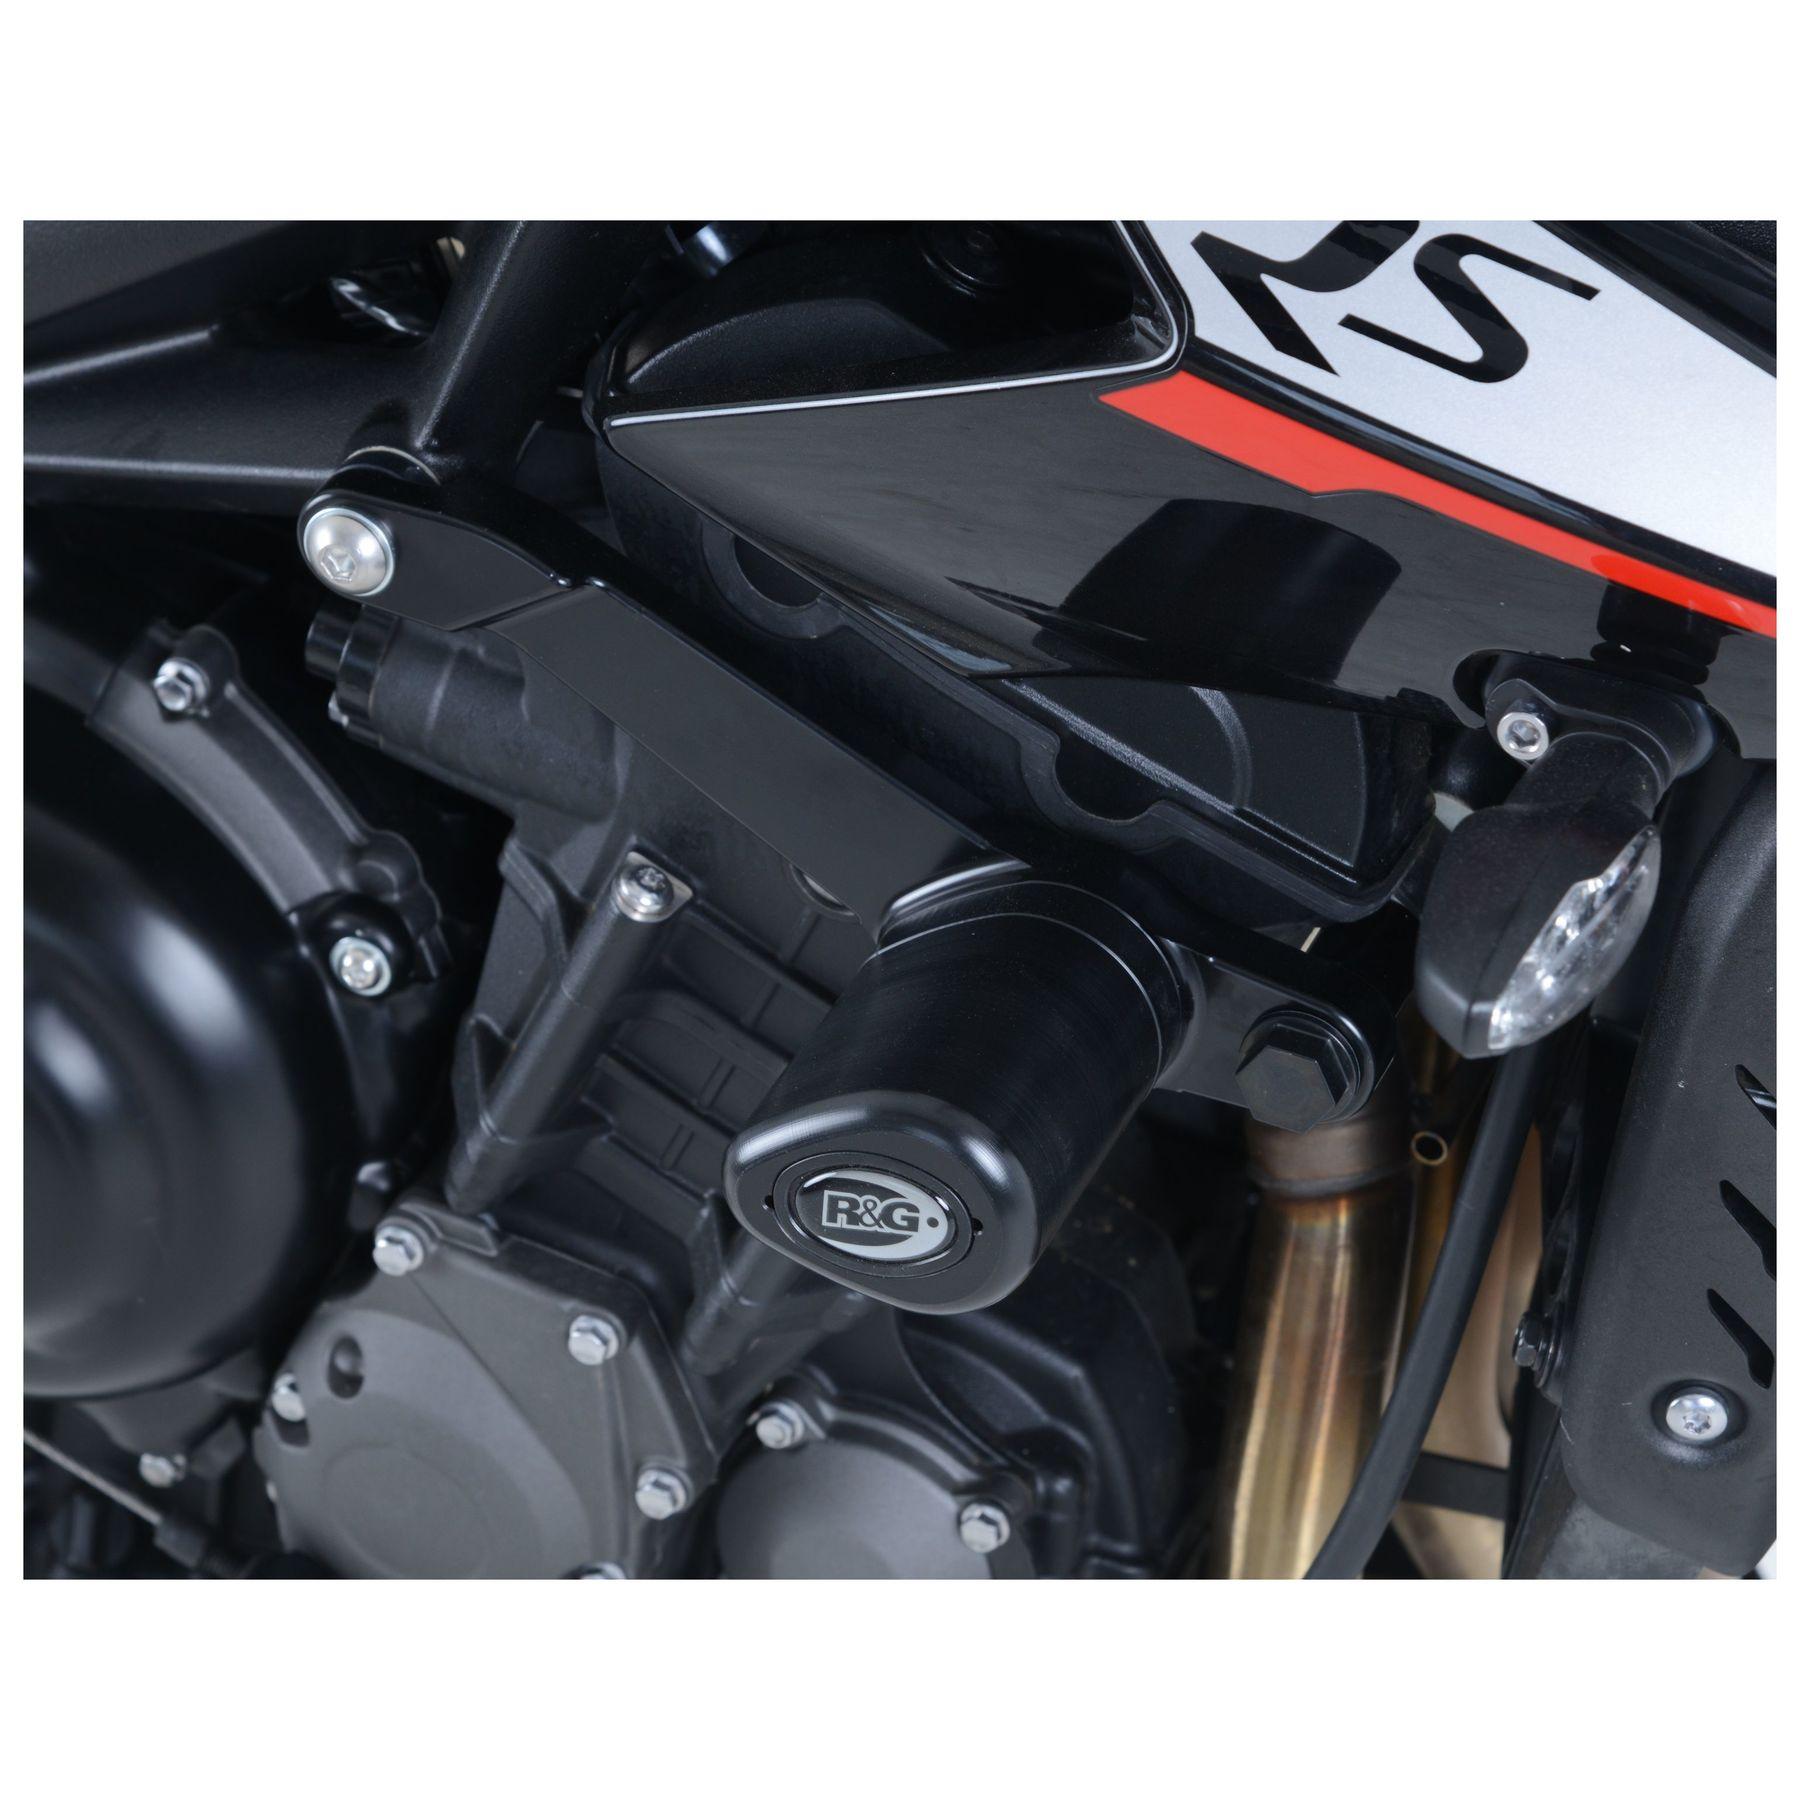 Street Triple S 765 18 /& Street Triple RS 765 18 R/&G Aero Style Frame Sliders for Triumph Street Triple R 765 18